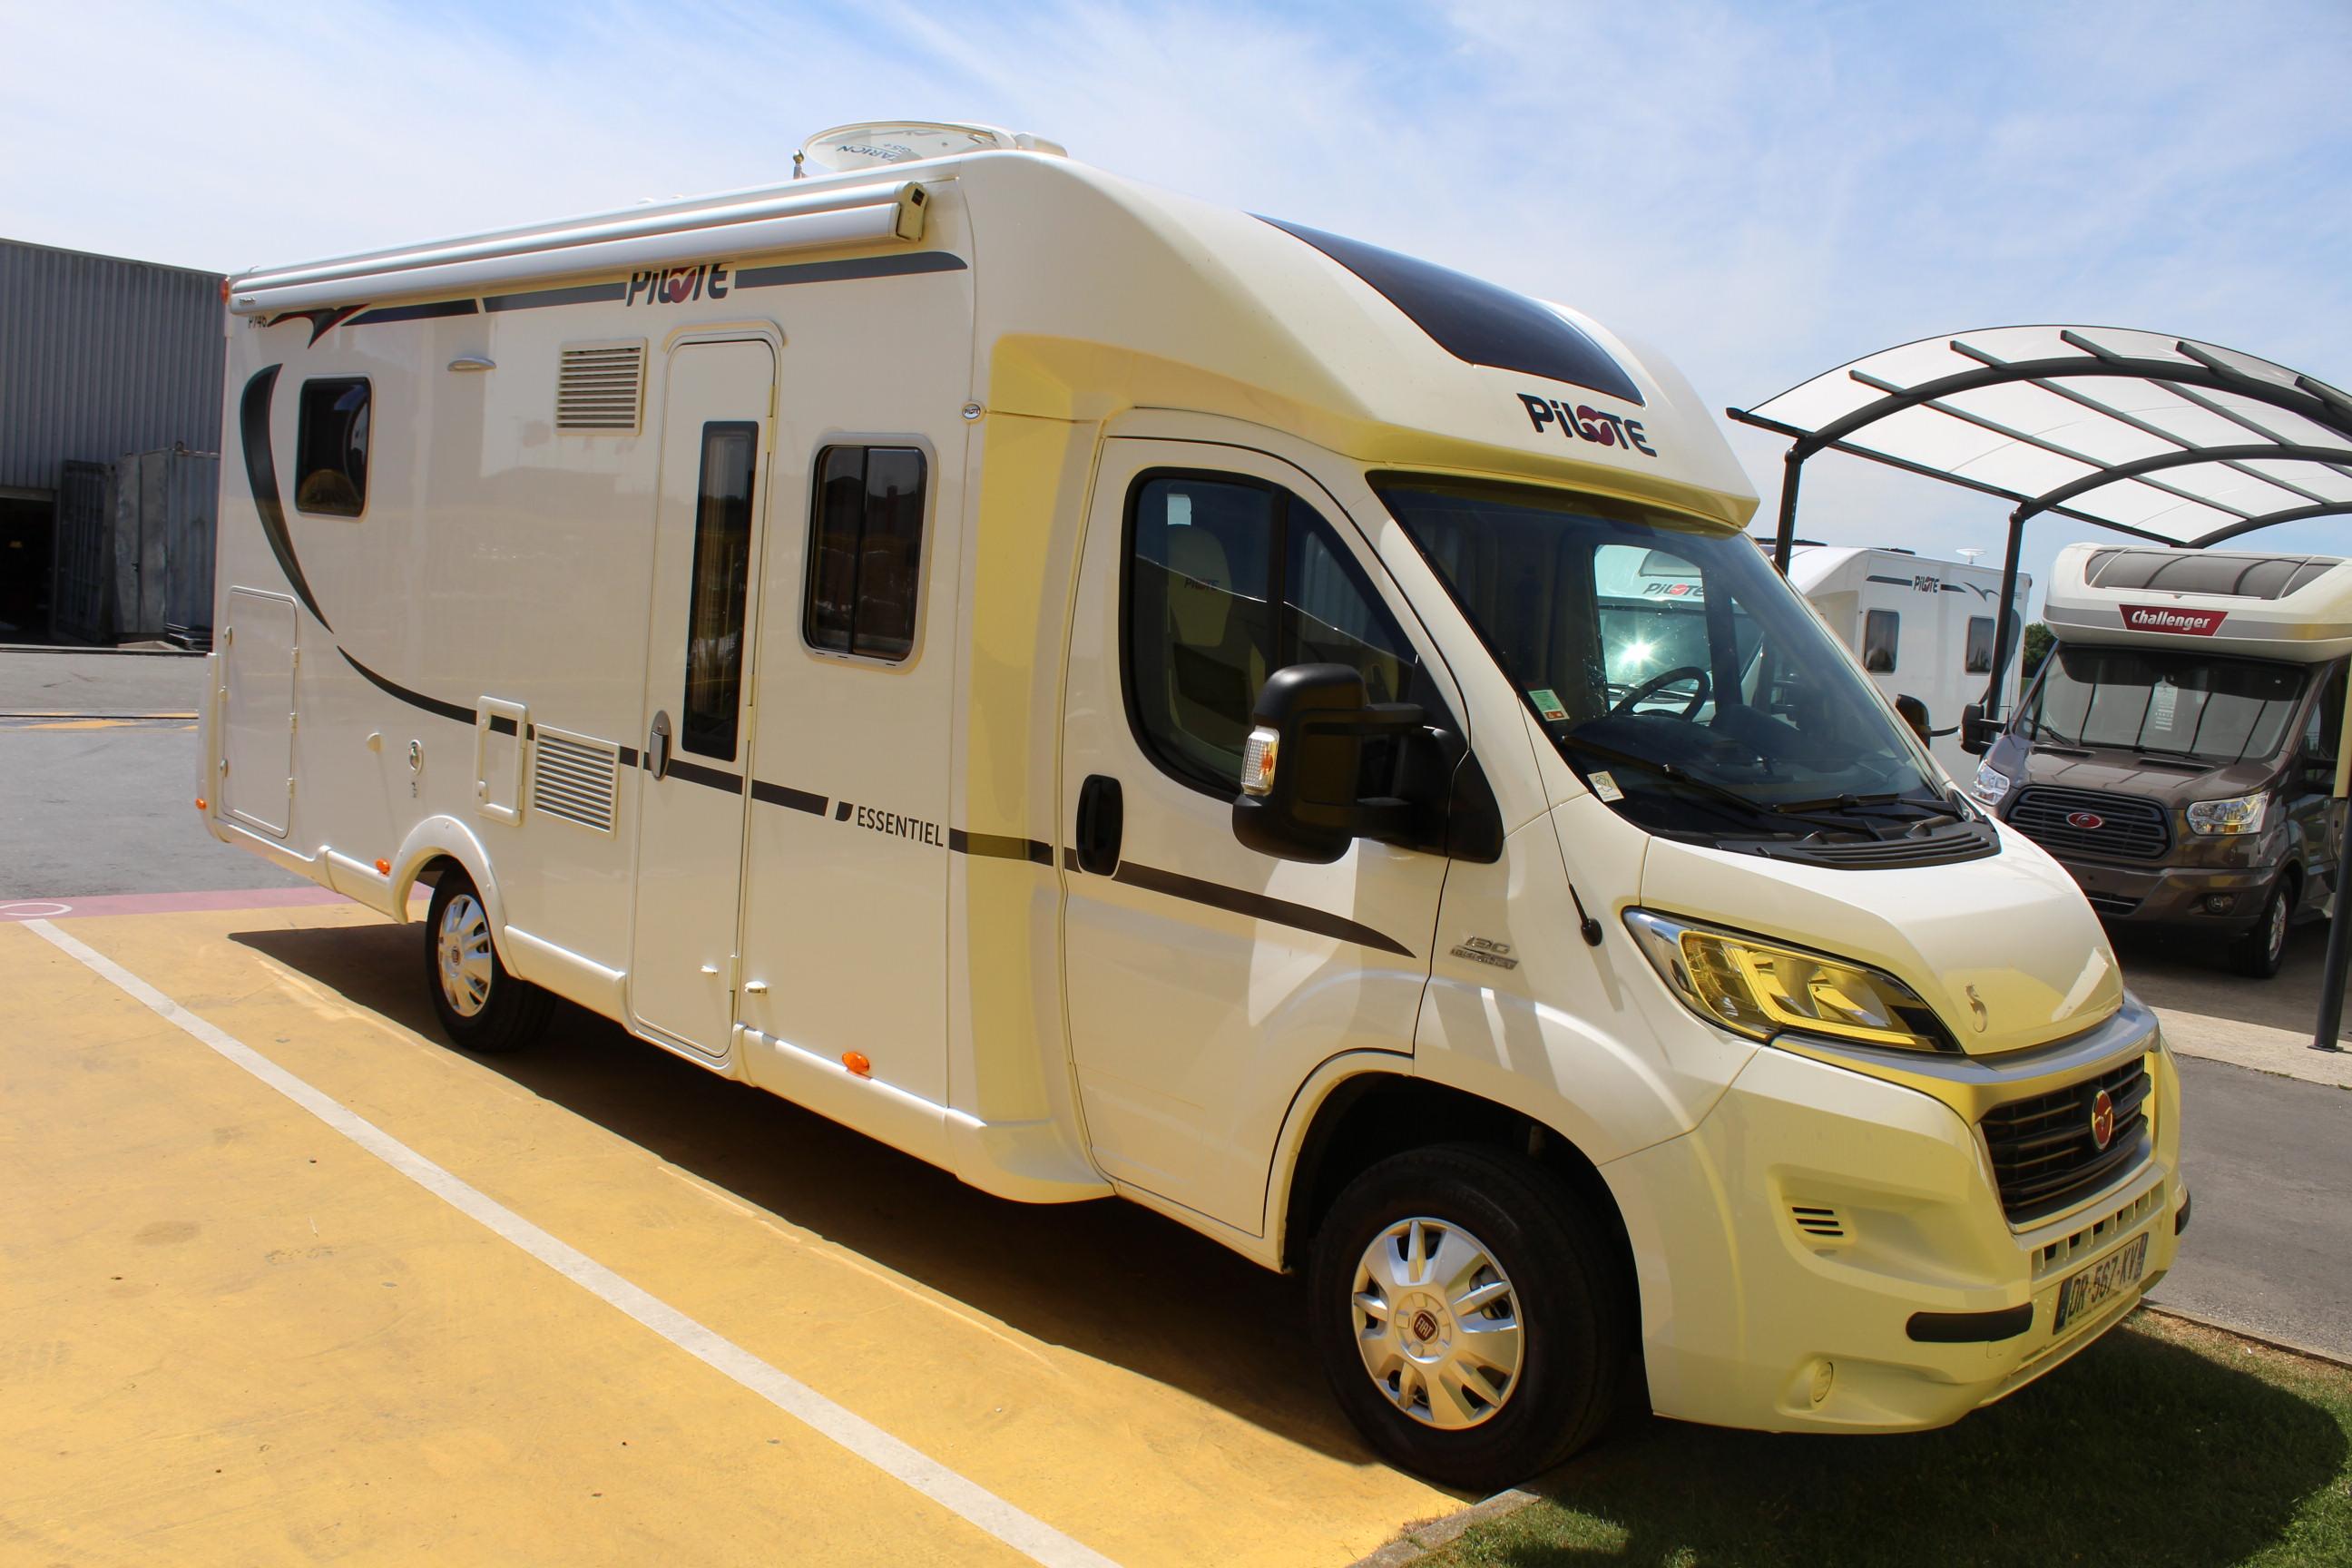 pilote p 746 c essentiel occasion de 2015 fiat camping car en vente seclin nord 59. Black Bedroom Furniture Sets. Home Design Ideas